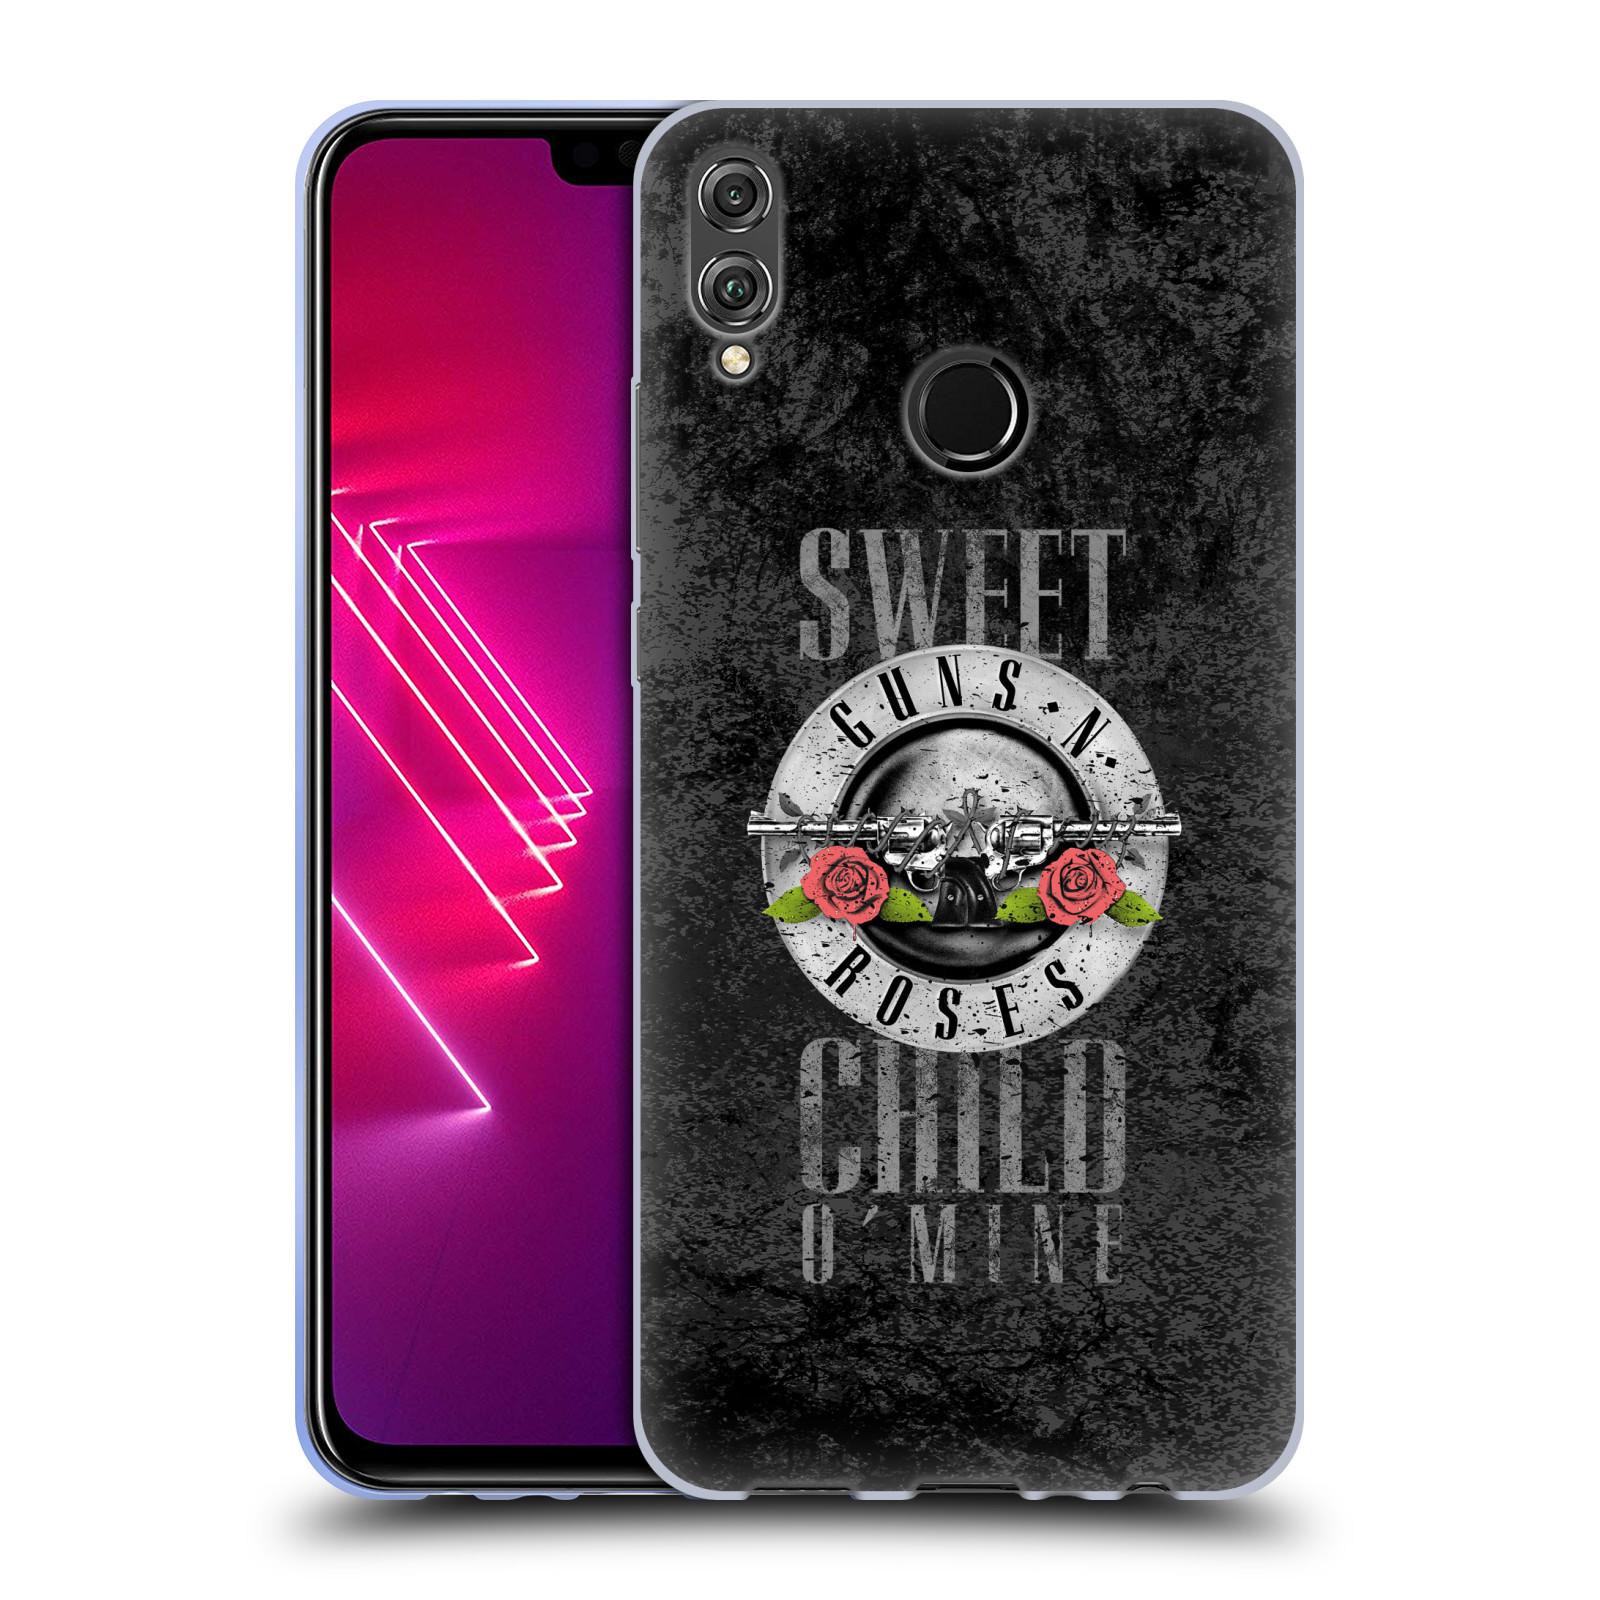 Silikonové pouzdro na mobil Honor View 10 Lite - Head Case - Guns N' Roses - Sweet Child